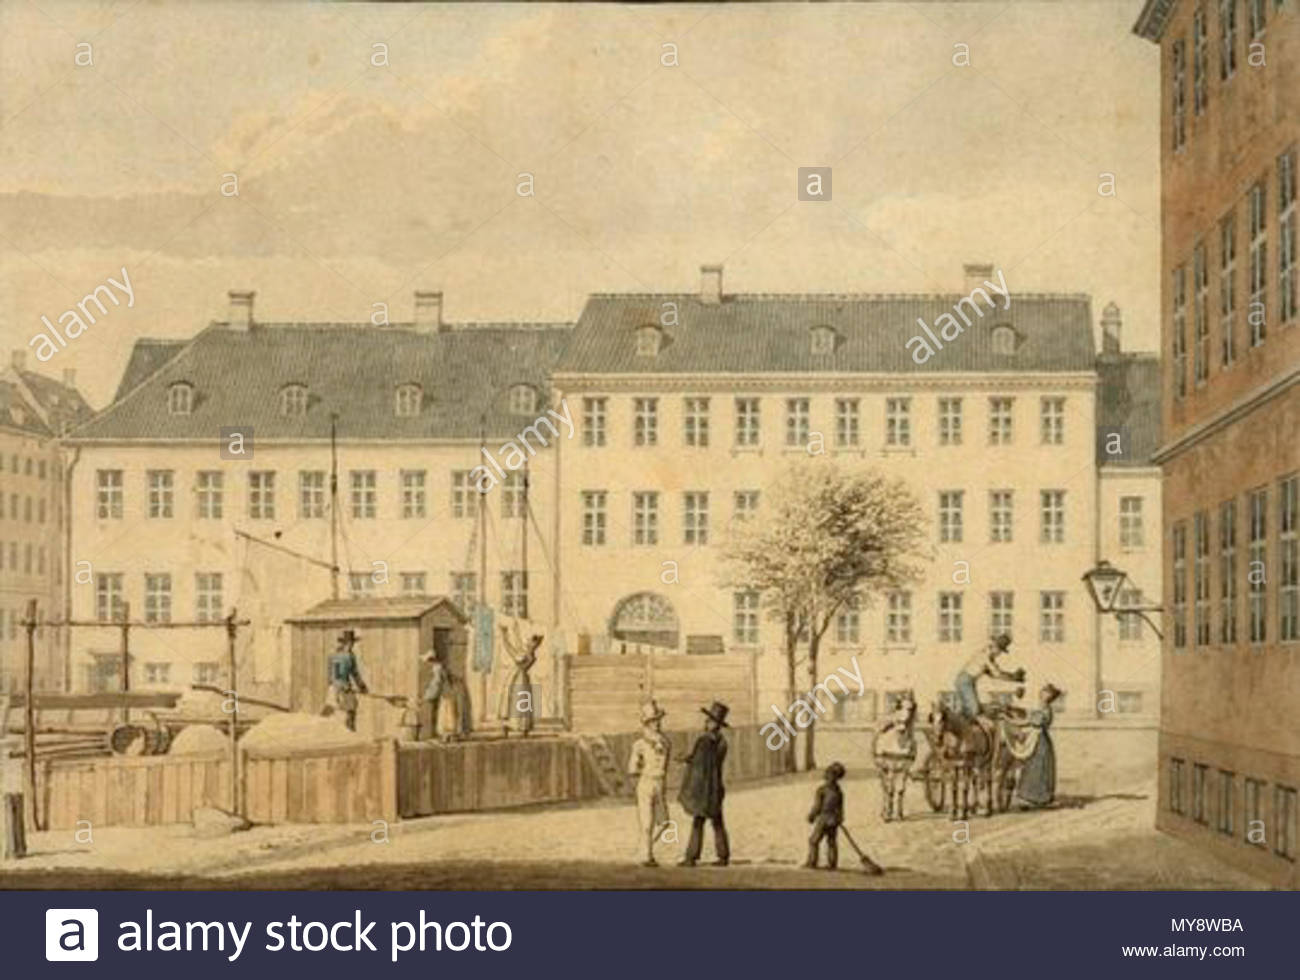 . Sandkiste (sand deposit?) - at Frederiksholms Kanal in Copenhagen, Denmark . 1835. G. F. Holm 227 H. G. F. Holm - Frederiksholms Kanal, 1835 - Stock Image